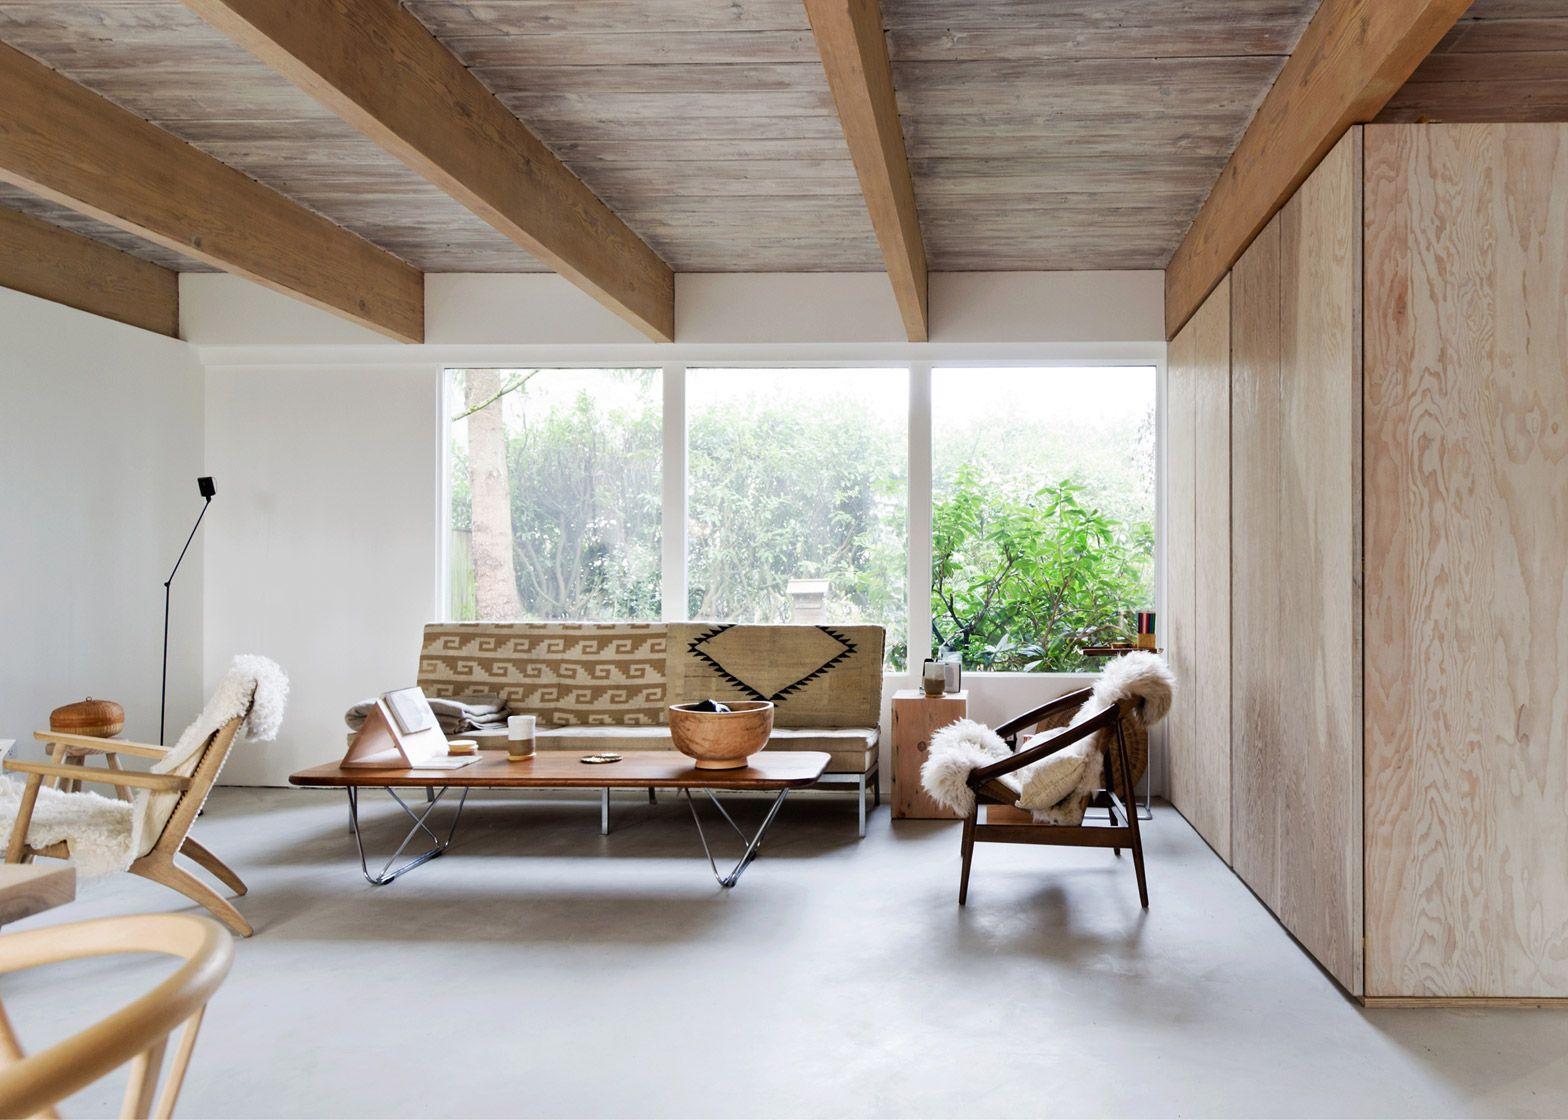 North Vancouver House by Scott & Scott | ideal interior | Pinterest ...